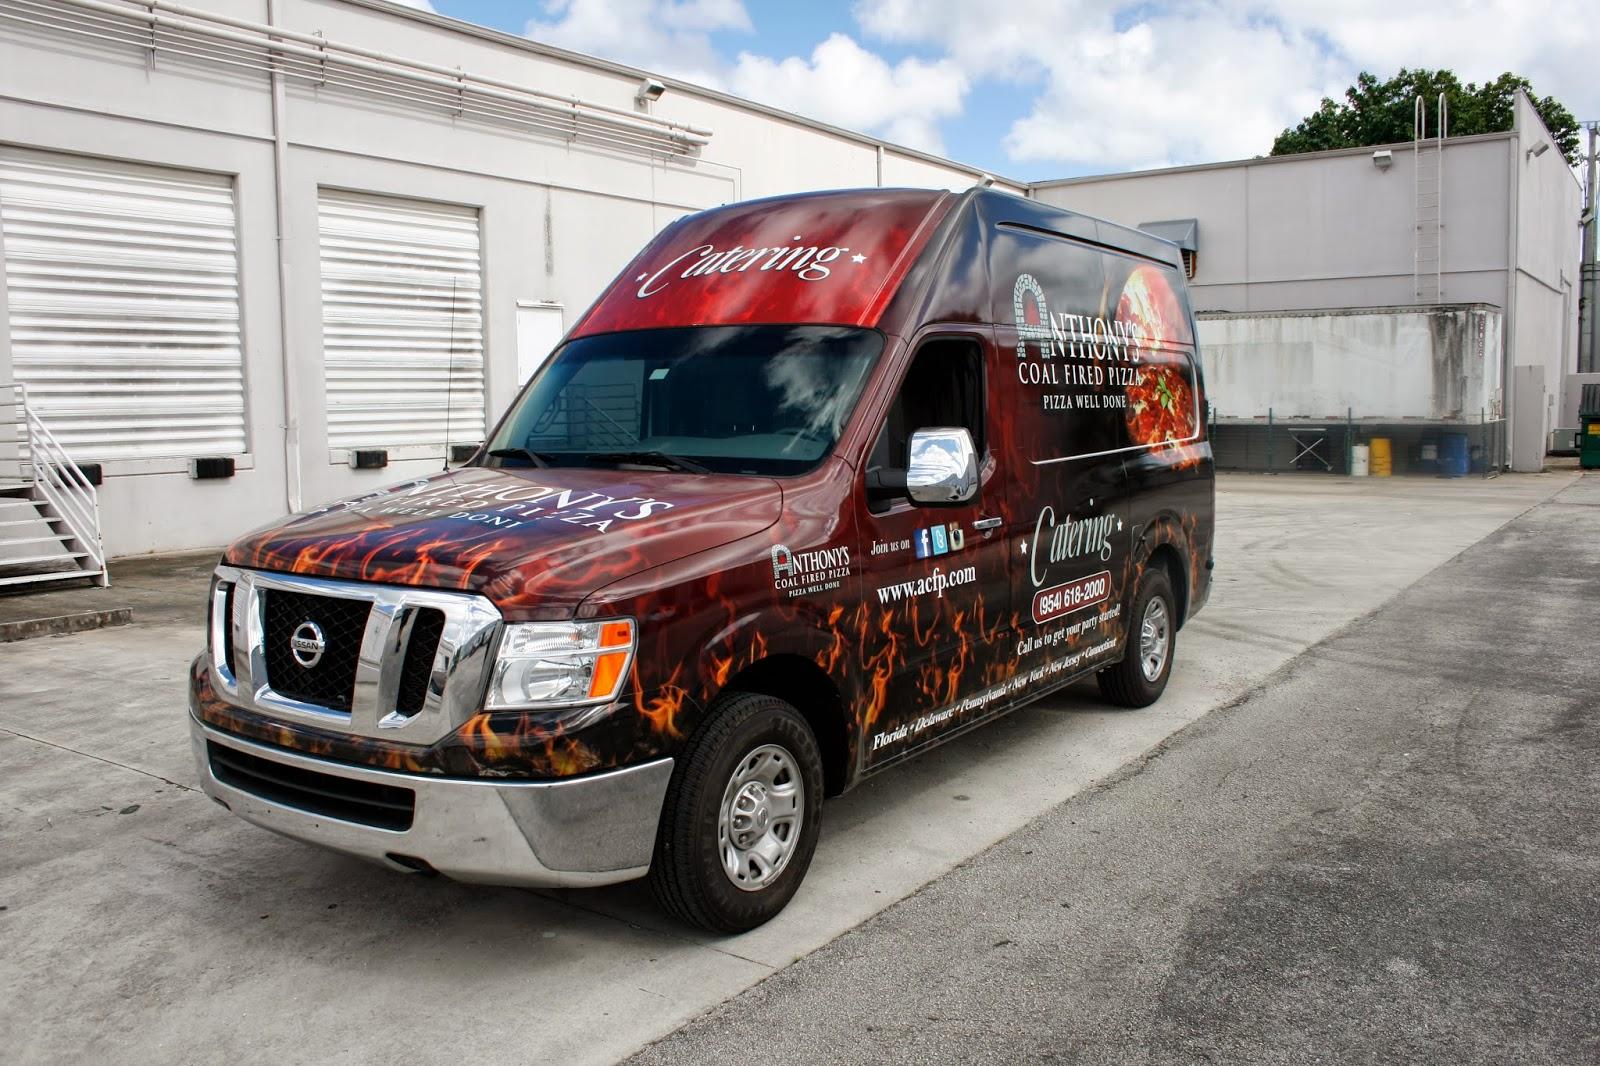 nissan nv van 3m vehicle wrap advertising anthony coal. Black Bedroom Furniture Sets. Home Design Ideas